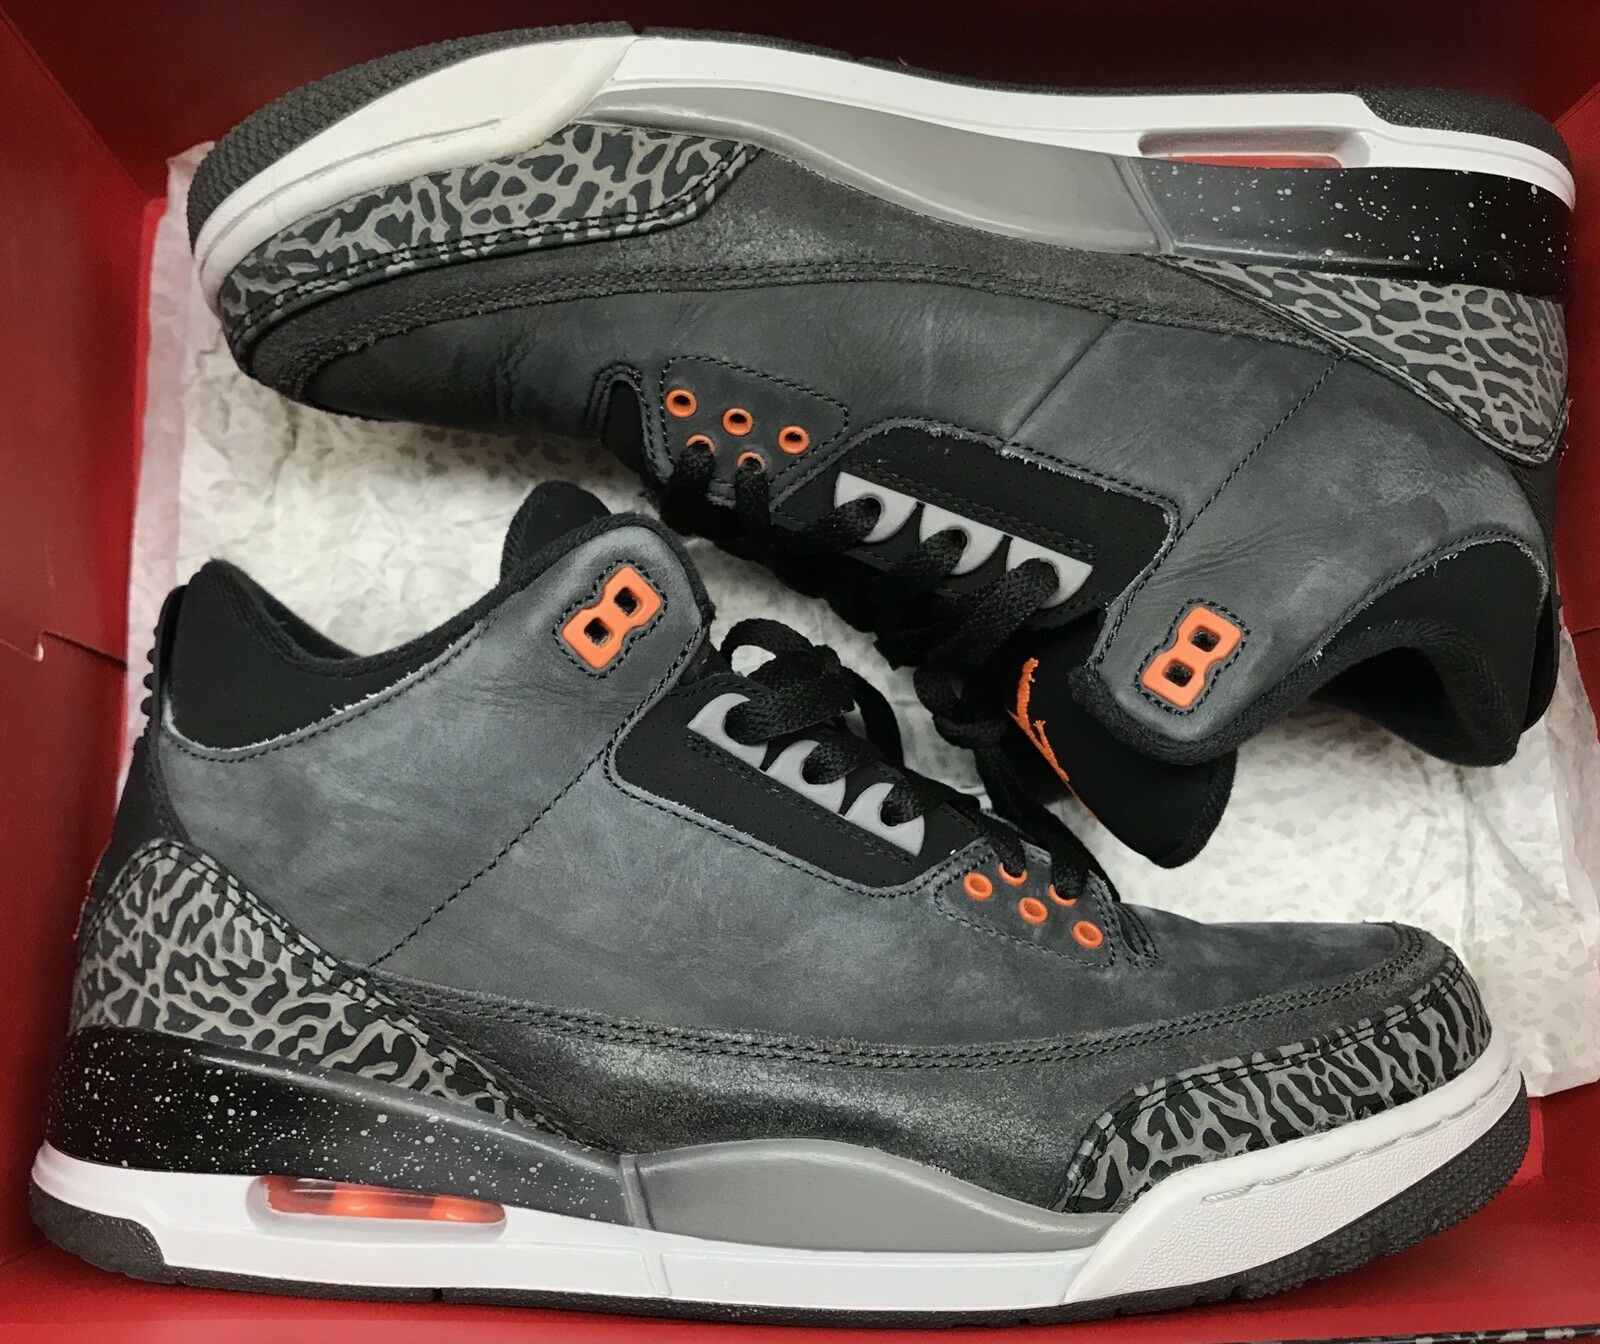 Jordan Retro III 3 Fear grigio arancia nero bianca Cement IV V 626967-040 Sz 10.5